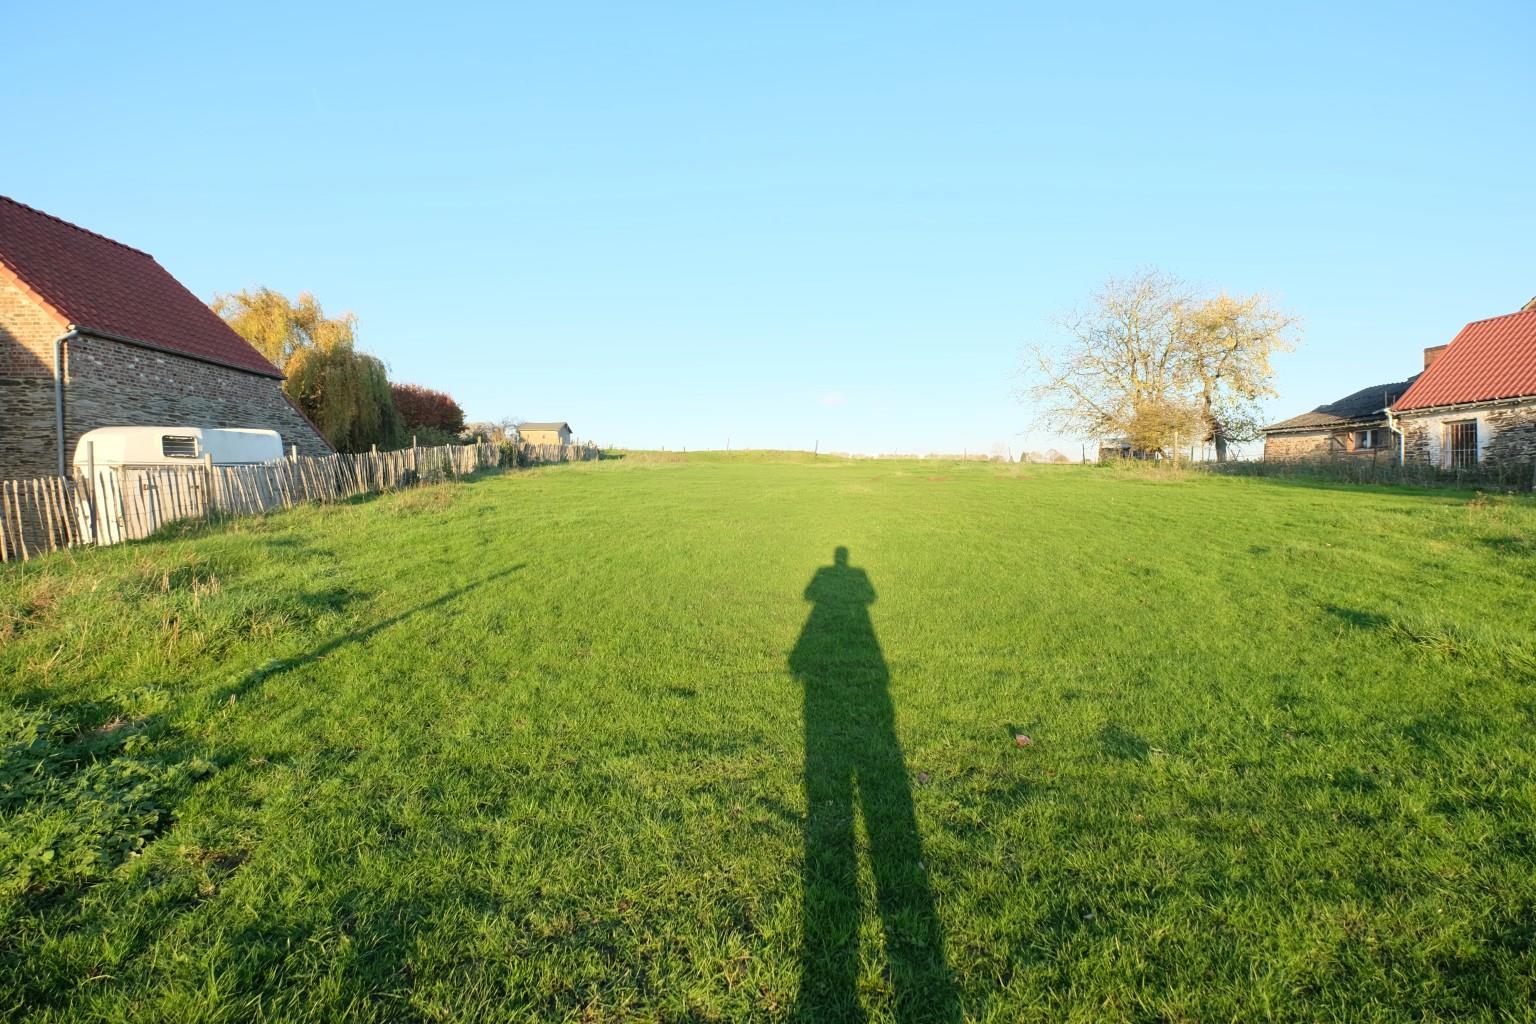 Terrain à bâtir - Braine-le-Comte Petit-Roeulxlez-Braine - #3949079-3